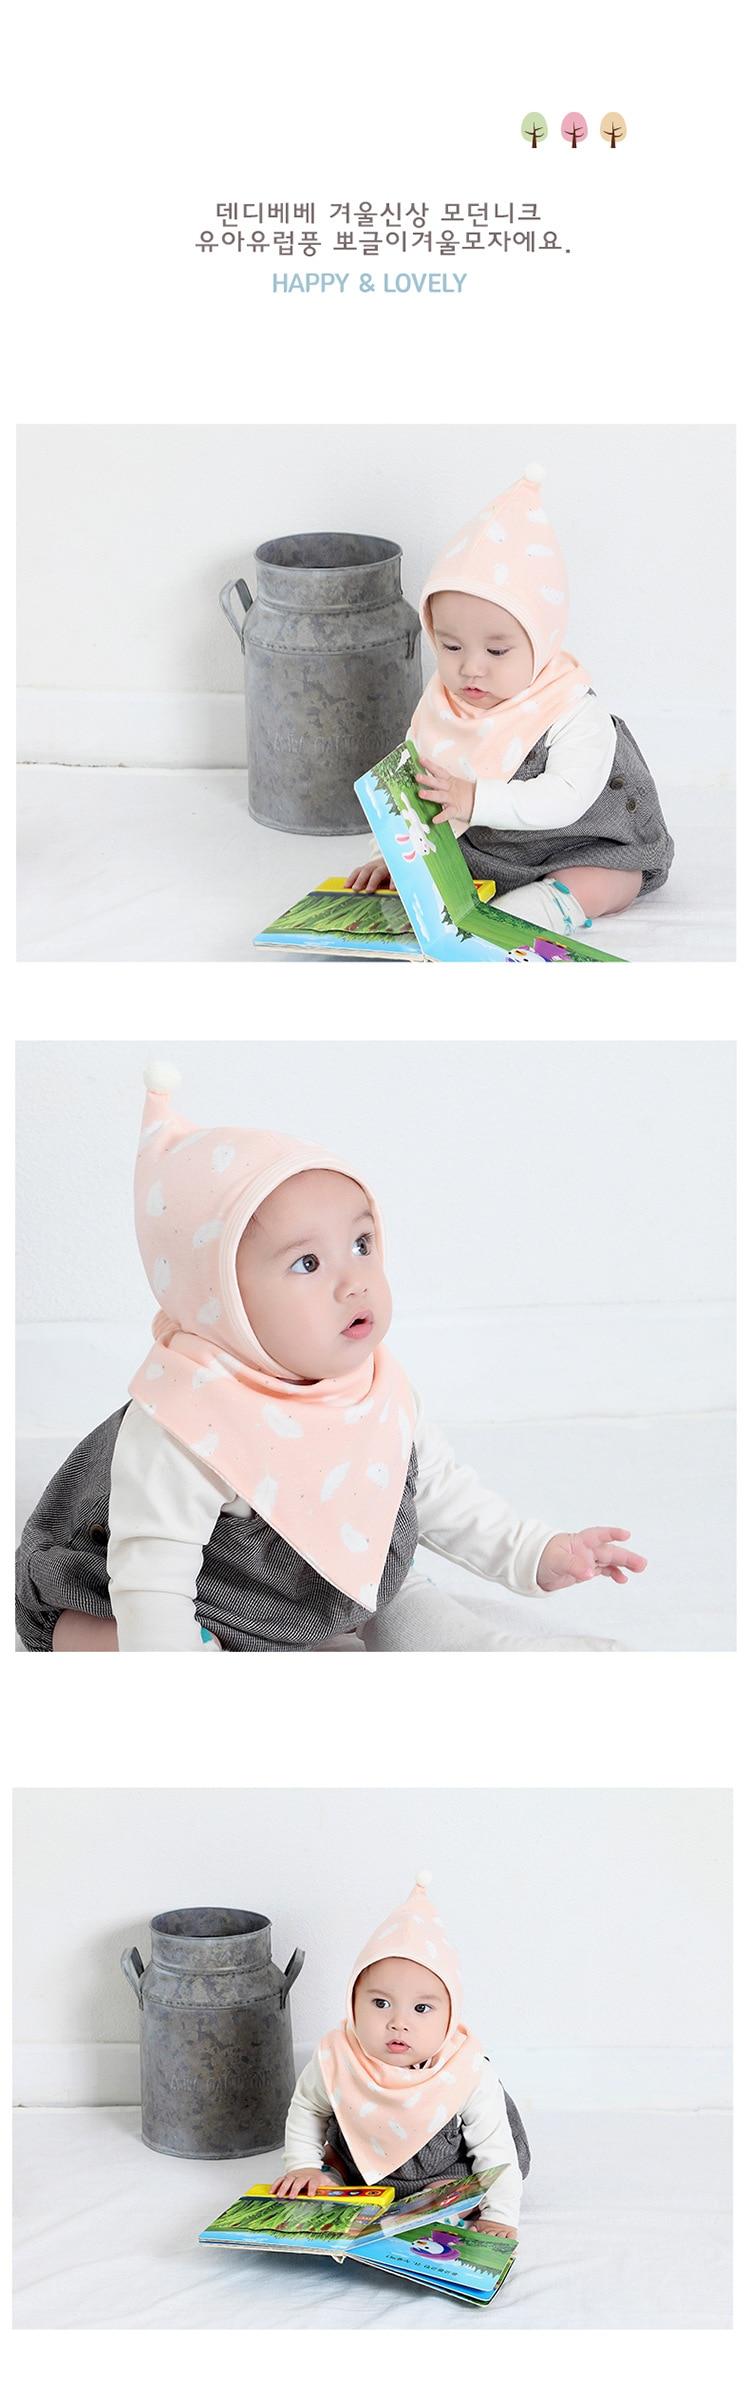 Baby Bibs Cute Cartoon Pattern Toddler Baby Waterproof Saliva Towel Cotton Fit 0-3 Years Old Infant Burp Cloths Feeding